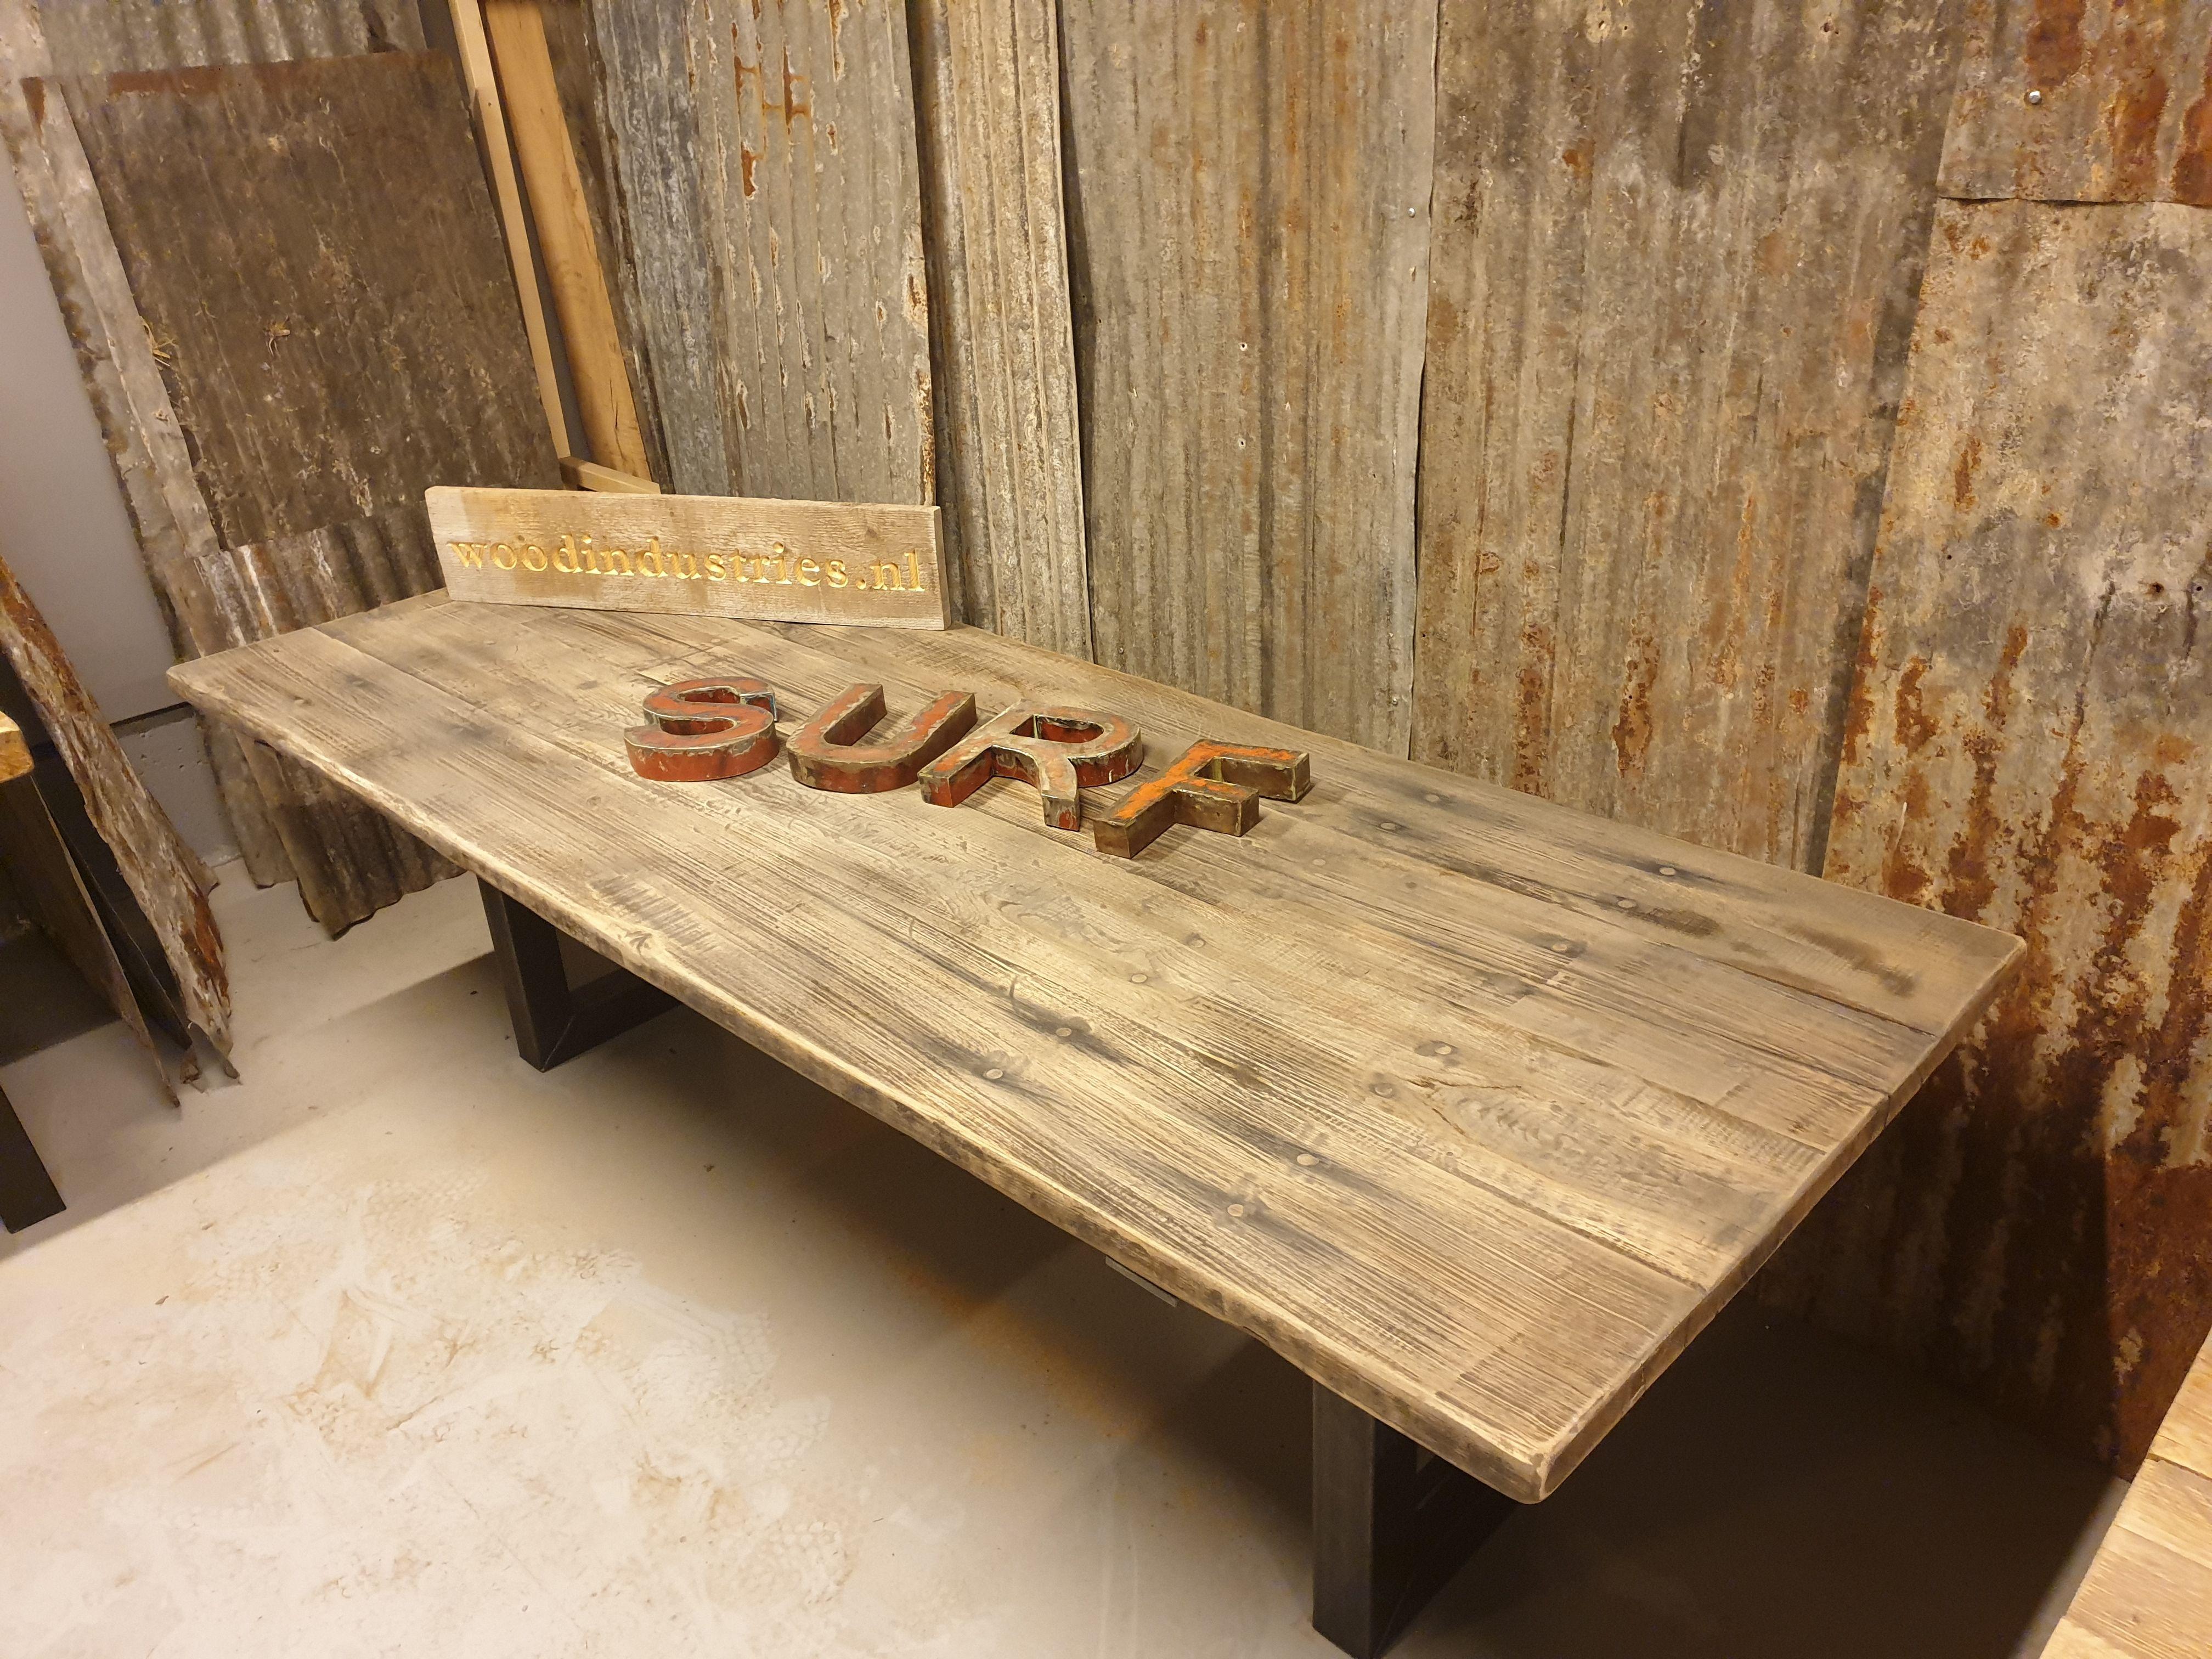 Eiken tafel gebinten barnwood in 2019 Industriële tafel